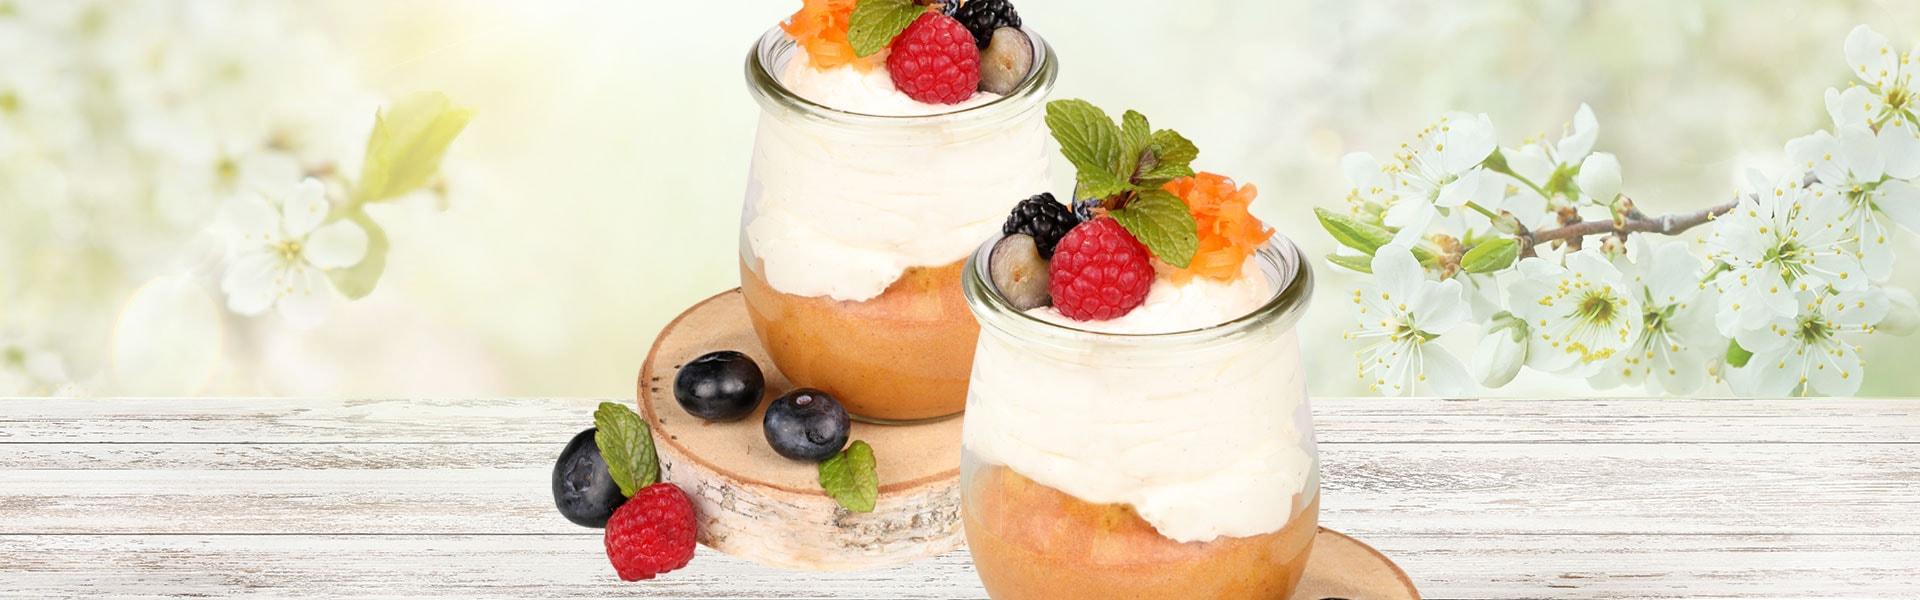 Carrot-Cake im Glas – Hollands Gourmet Service Osterrezepte